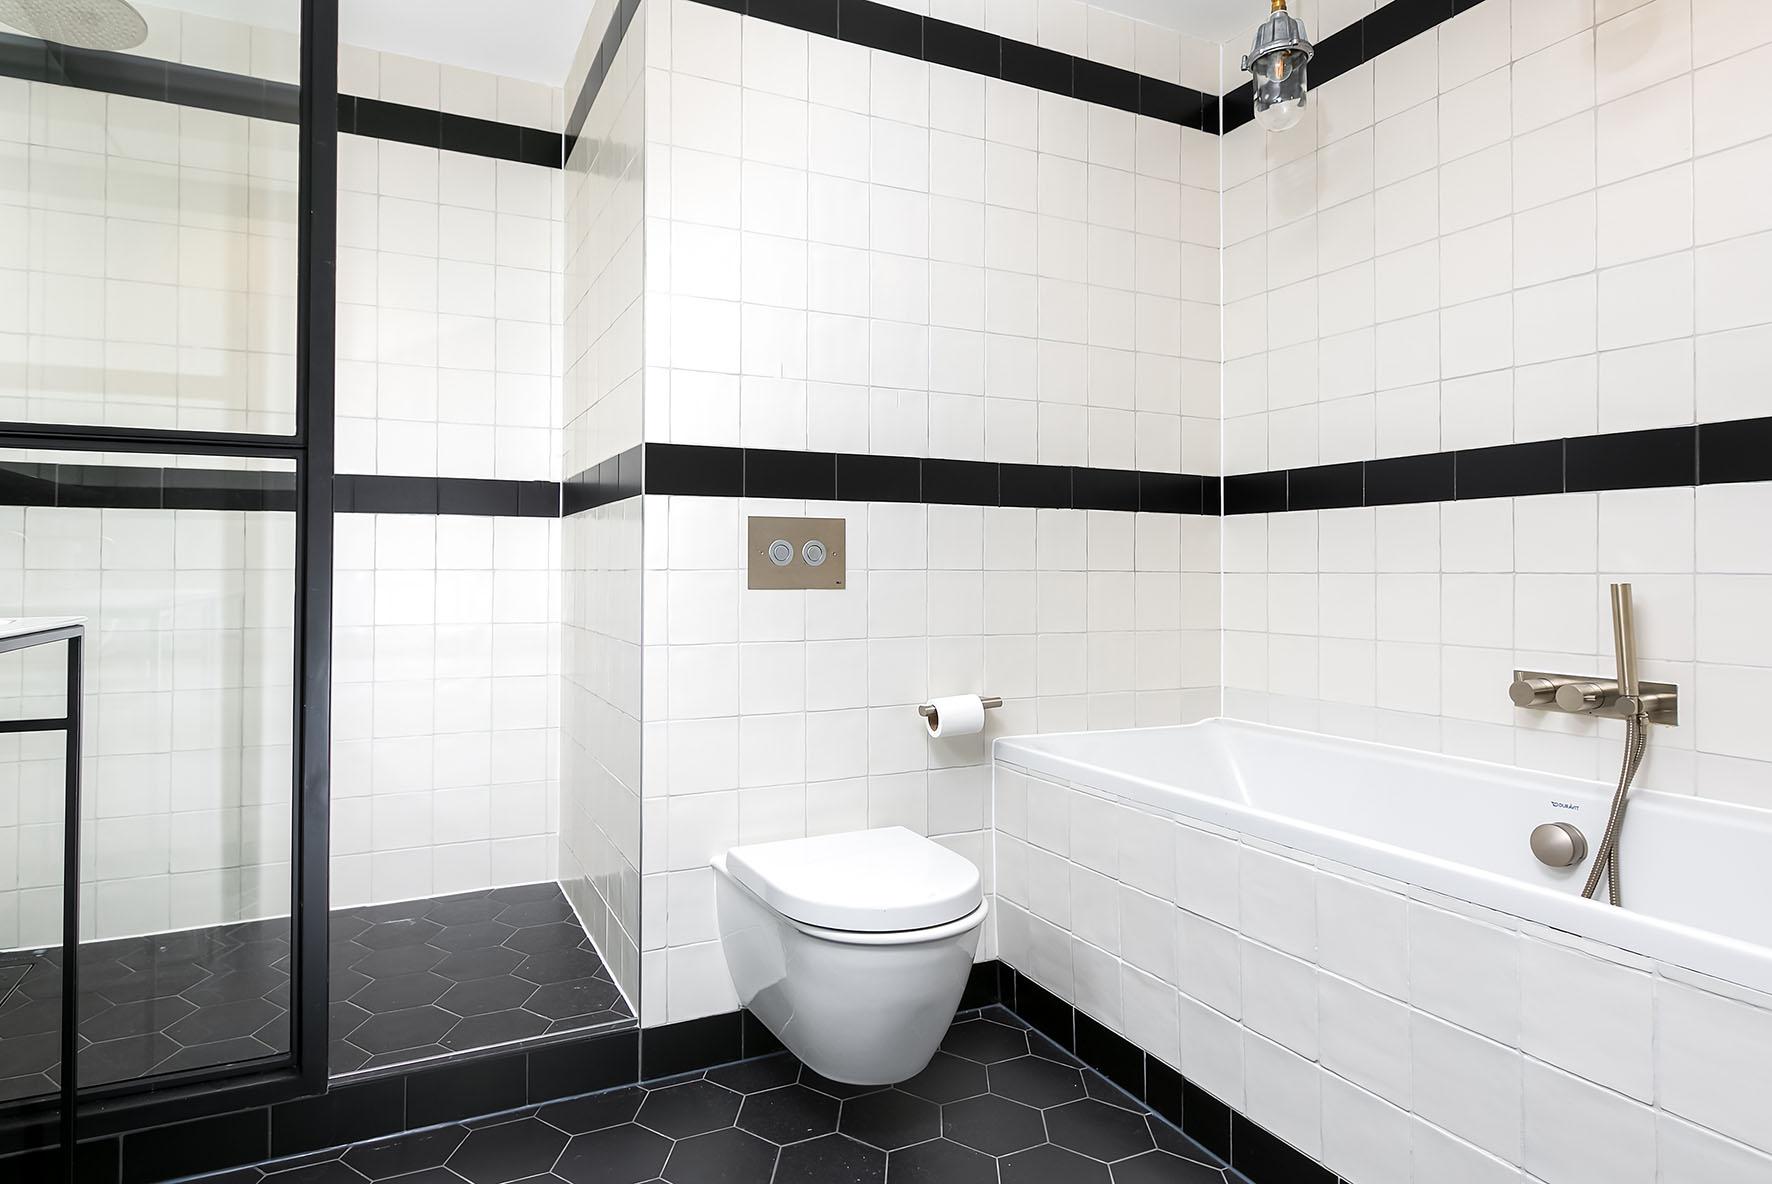 Lovelydays luxury service apartment rental - London - Soho - Noel Street VI - Lovelysuite - 2 bedrooms - 2 bathrooms - Beautiful bathtub - 3b93b9e5dc11 - Lovelydays